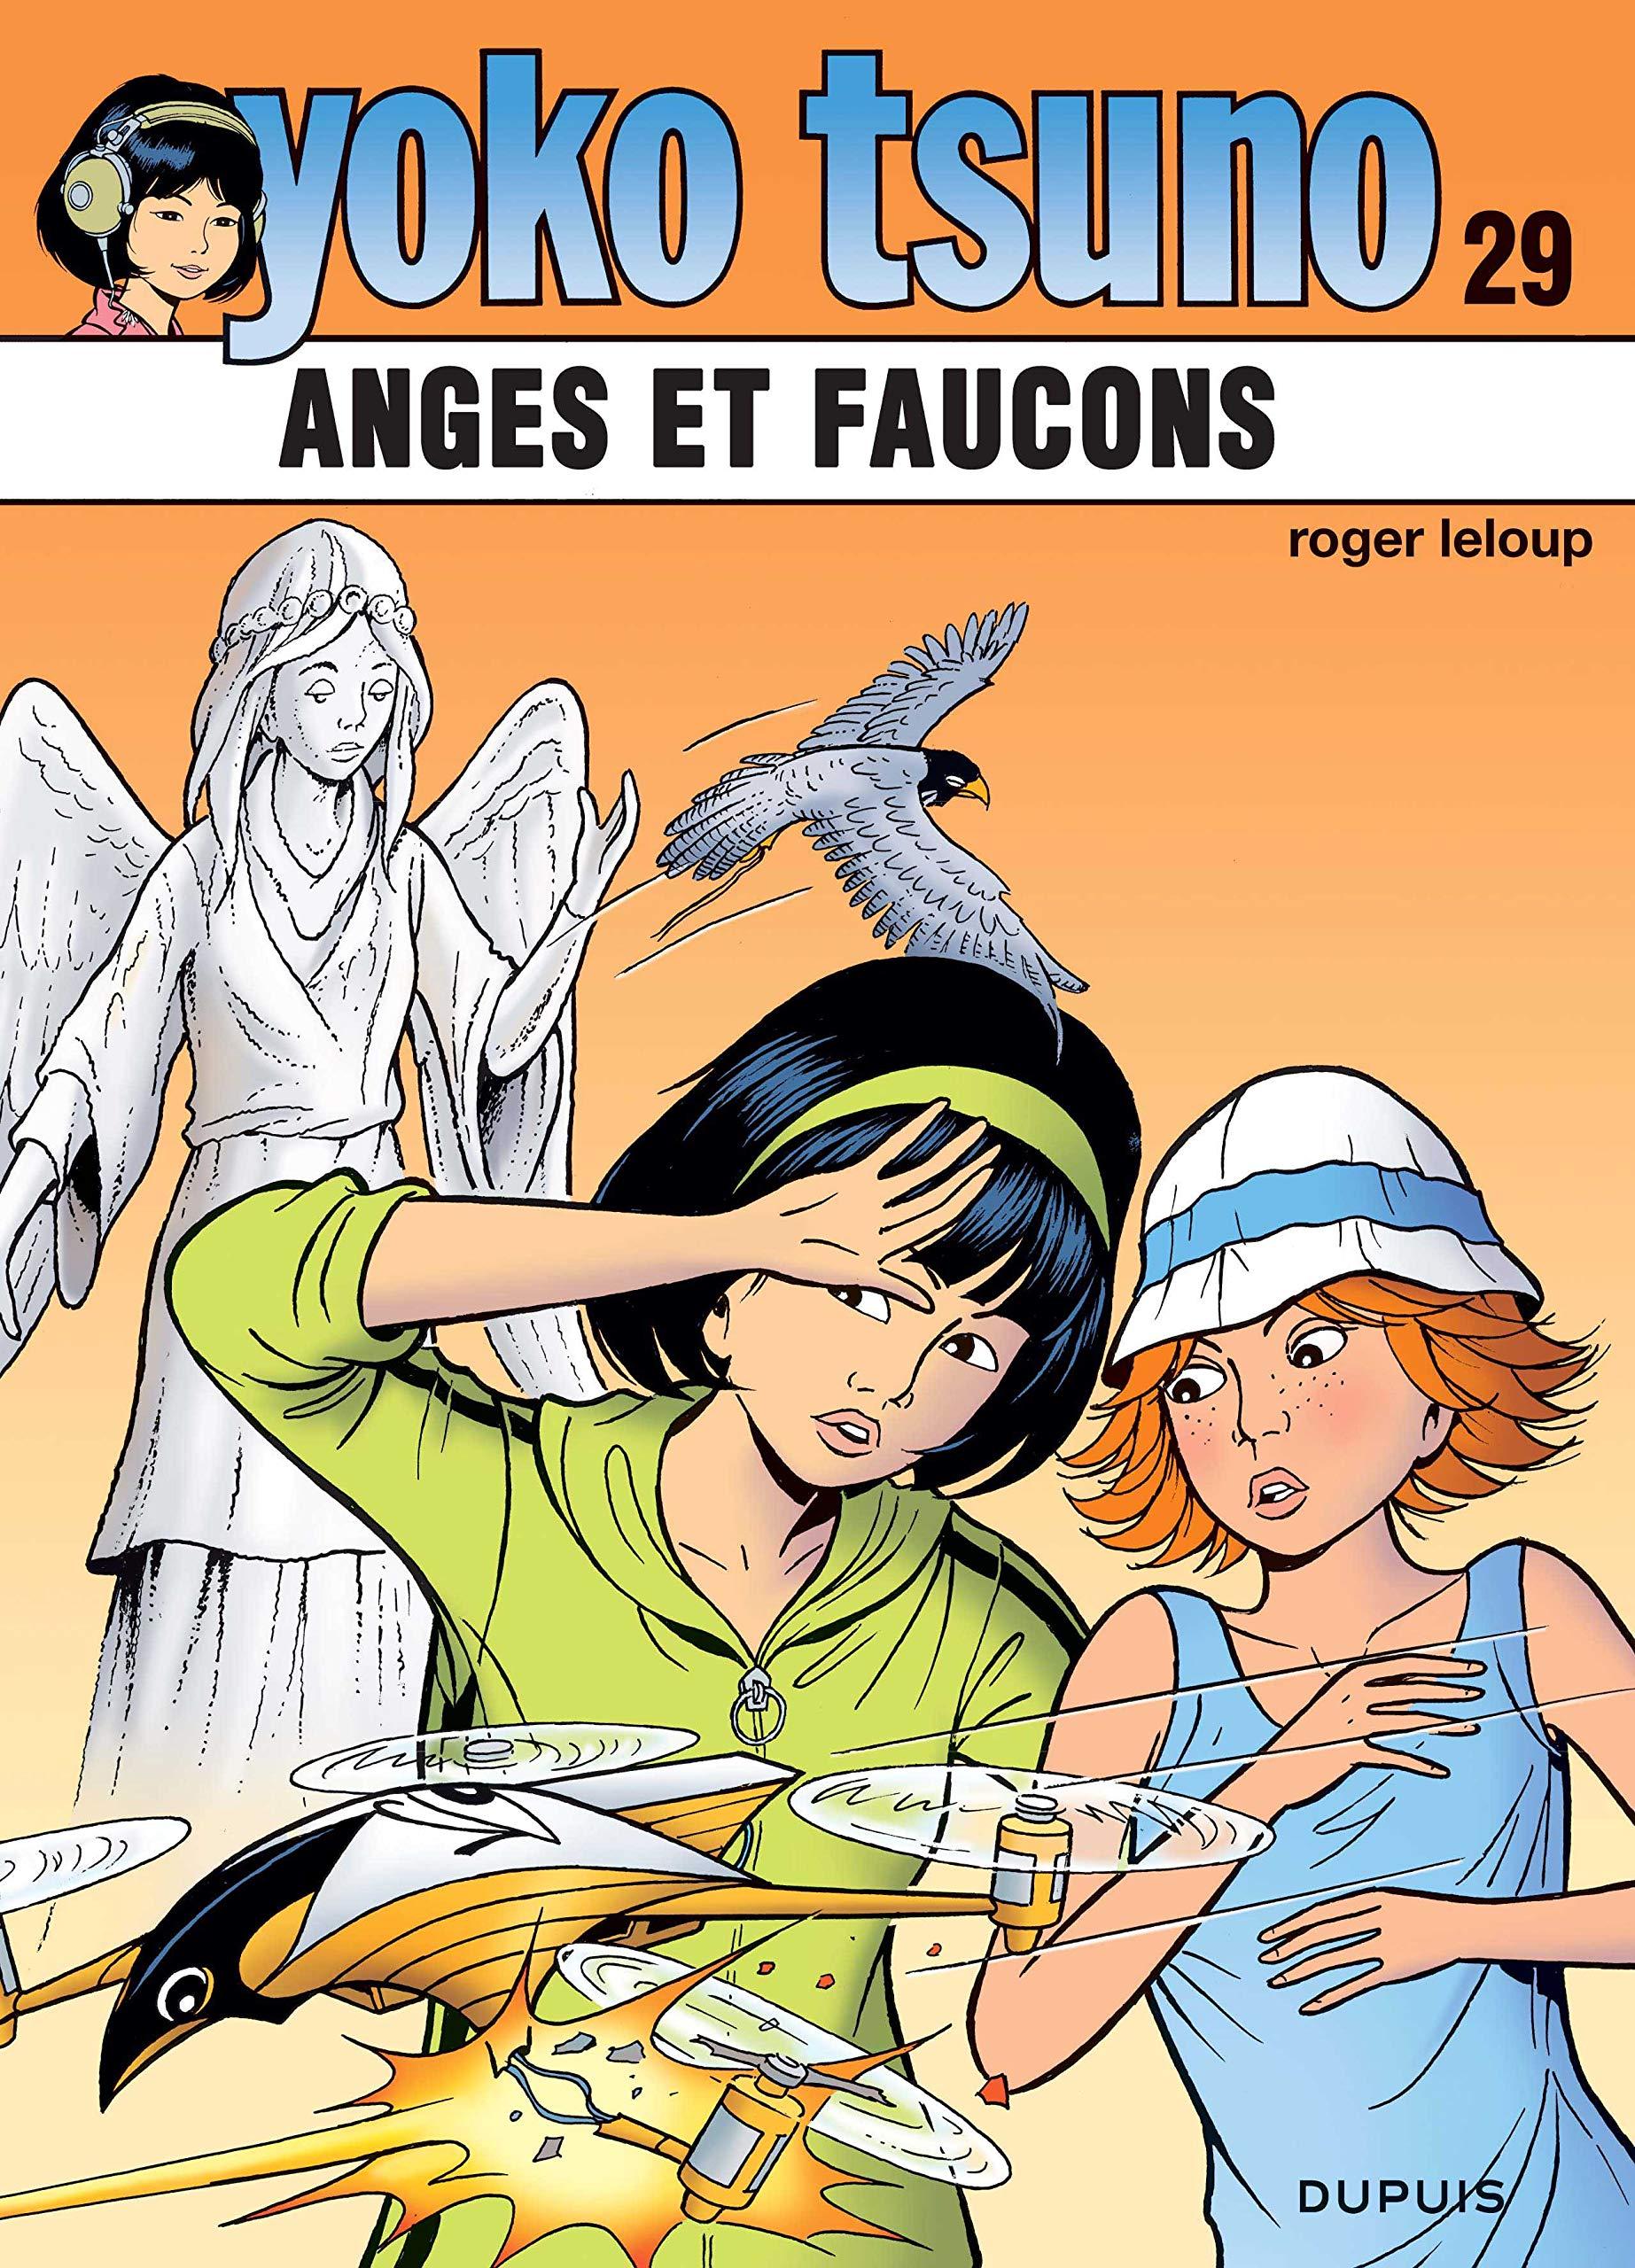 Yoko Tsuno 29 - Anges et faucons